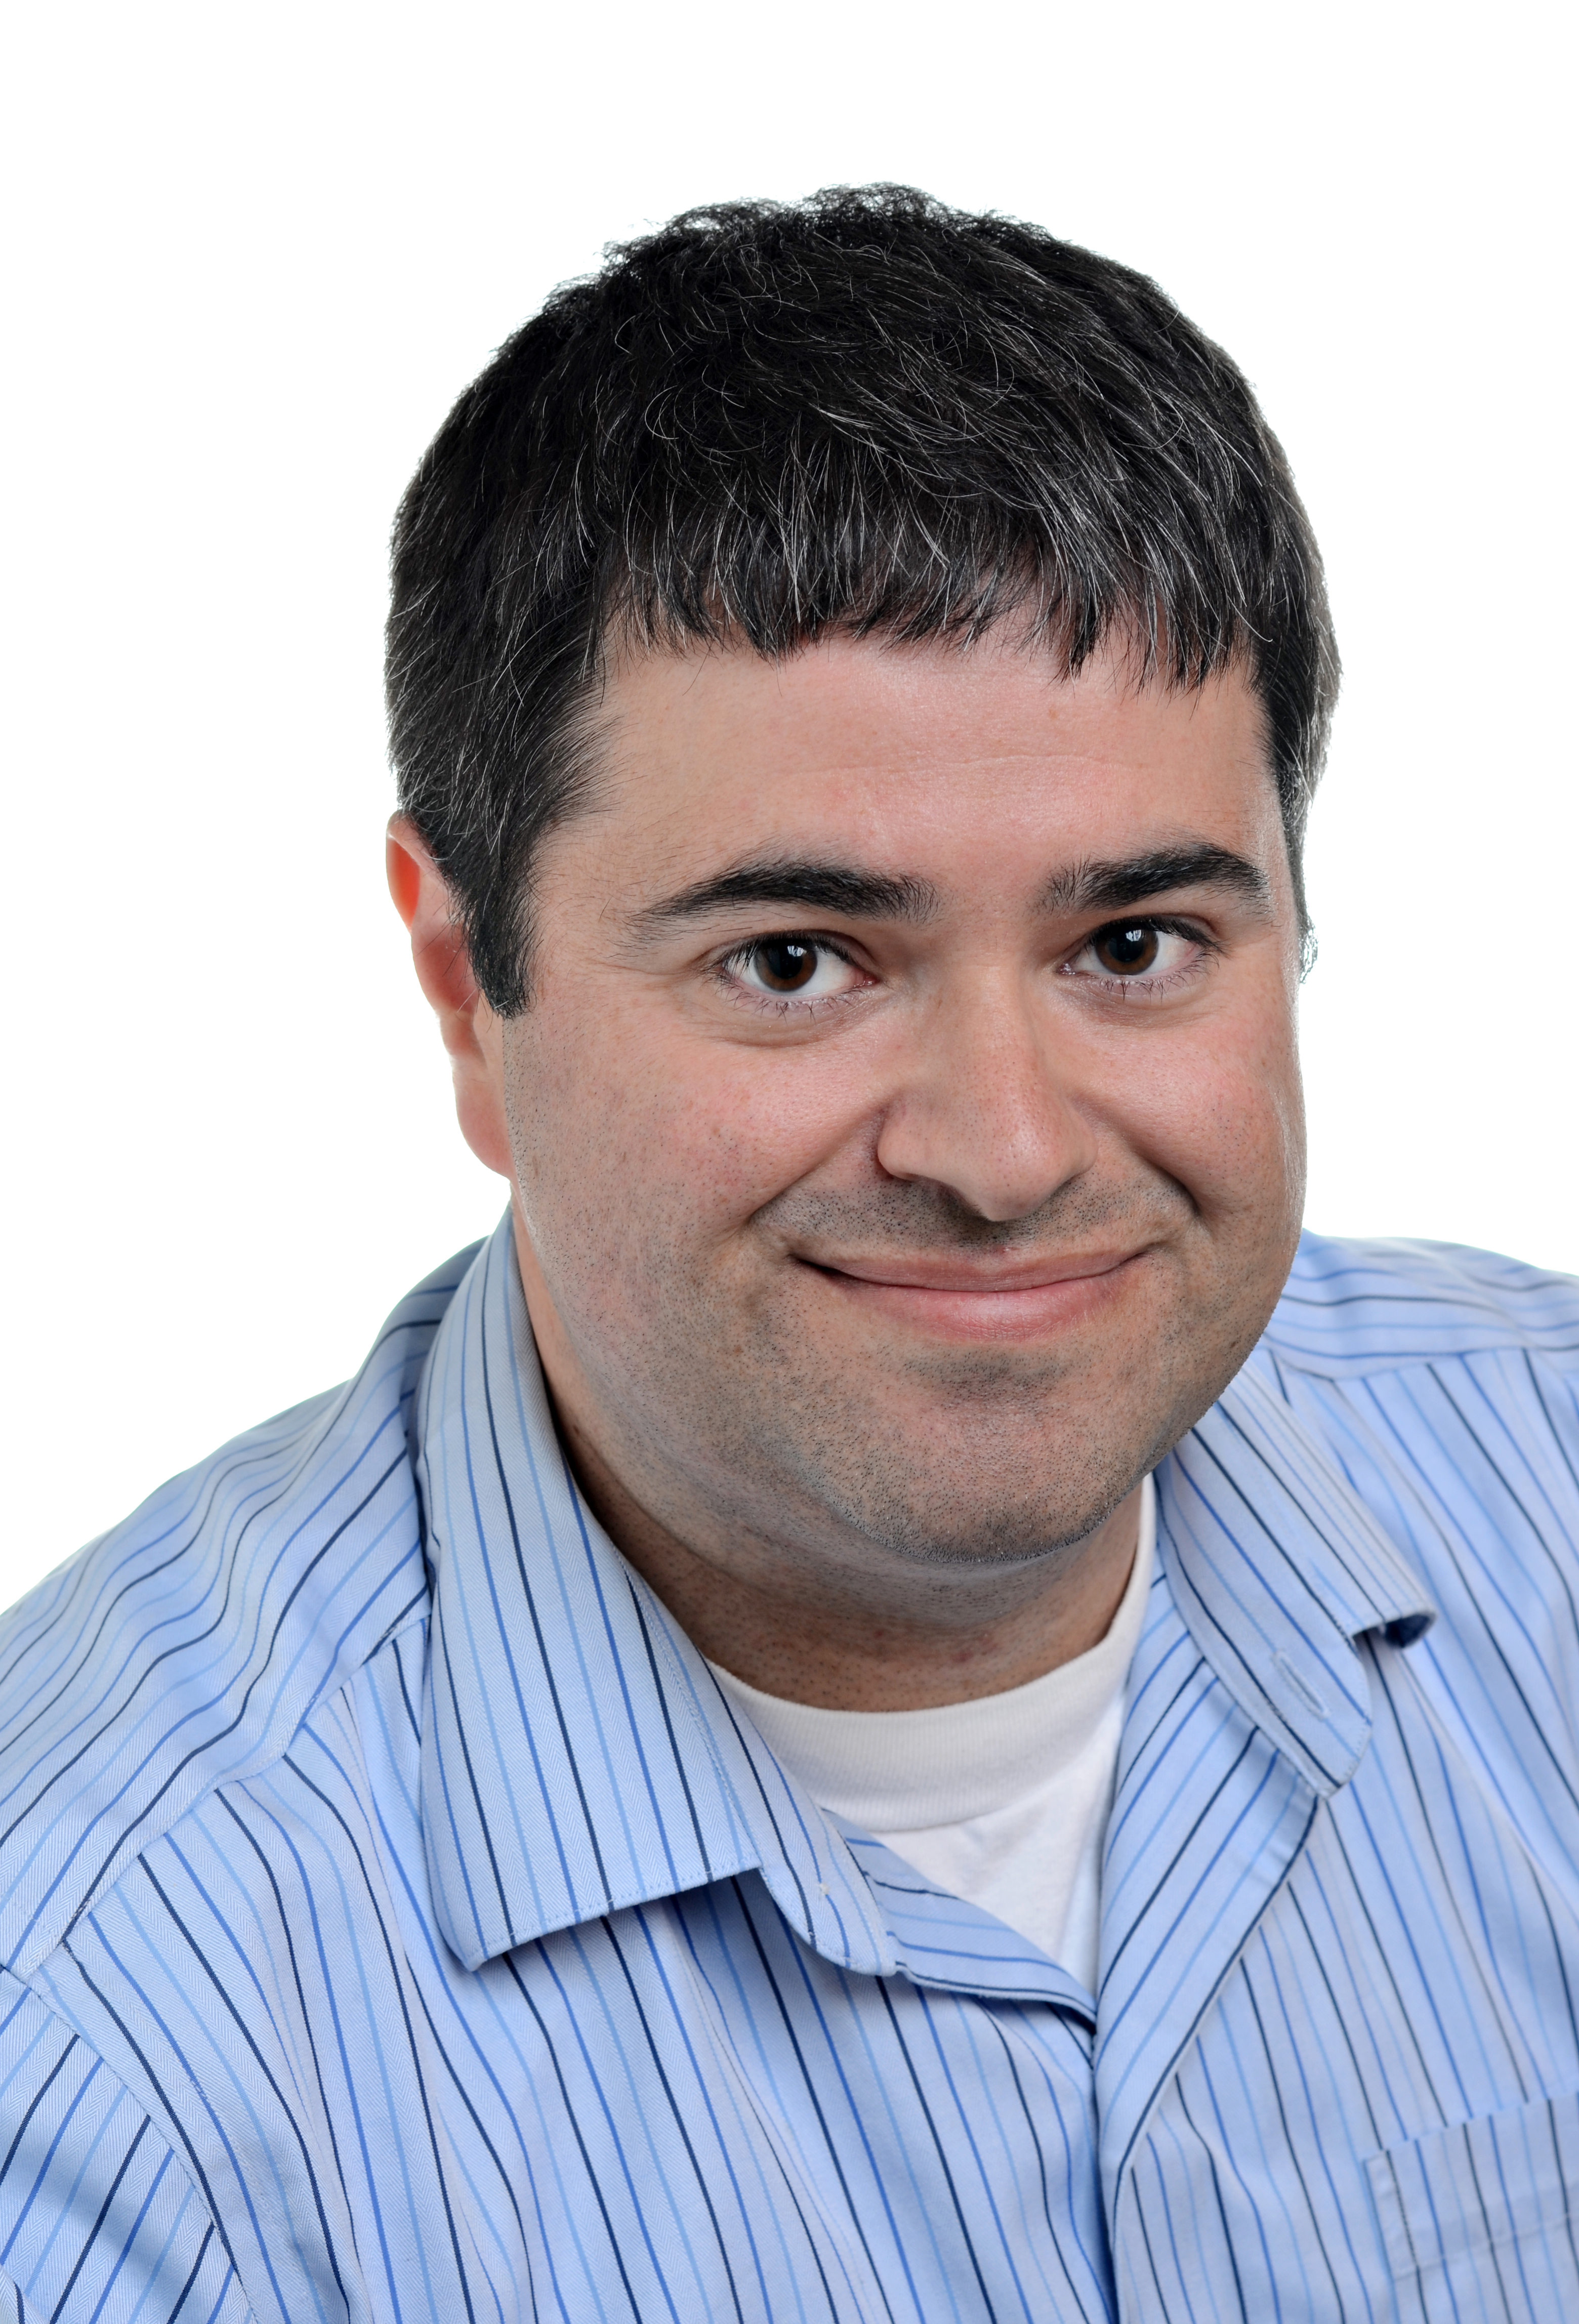 Joe Rocca